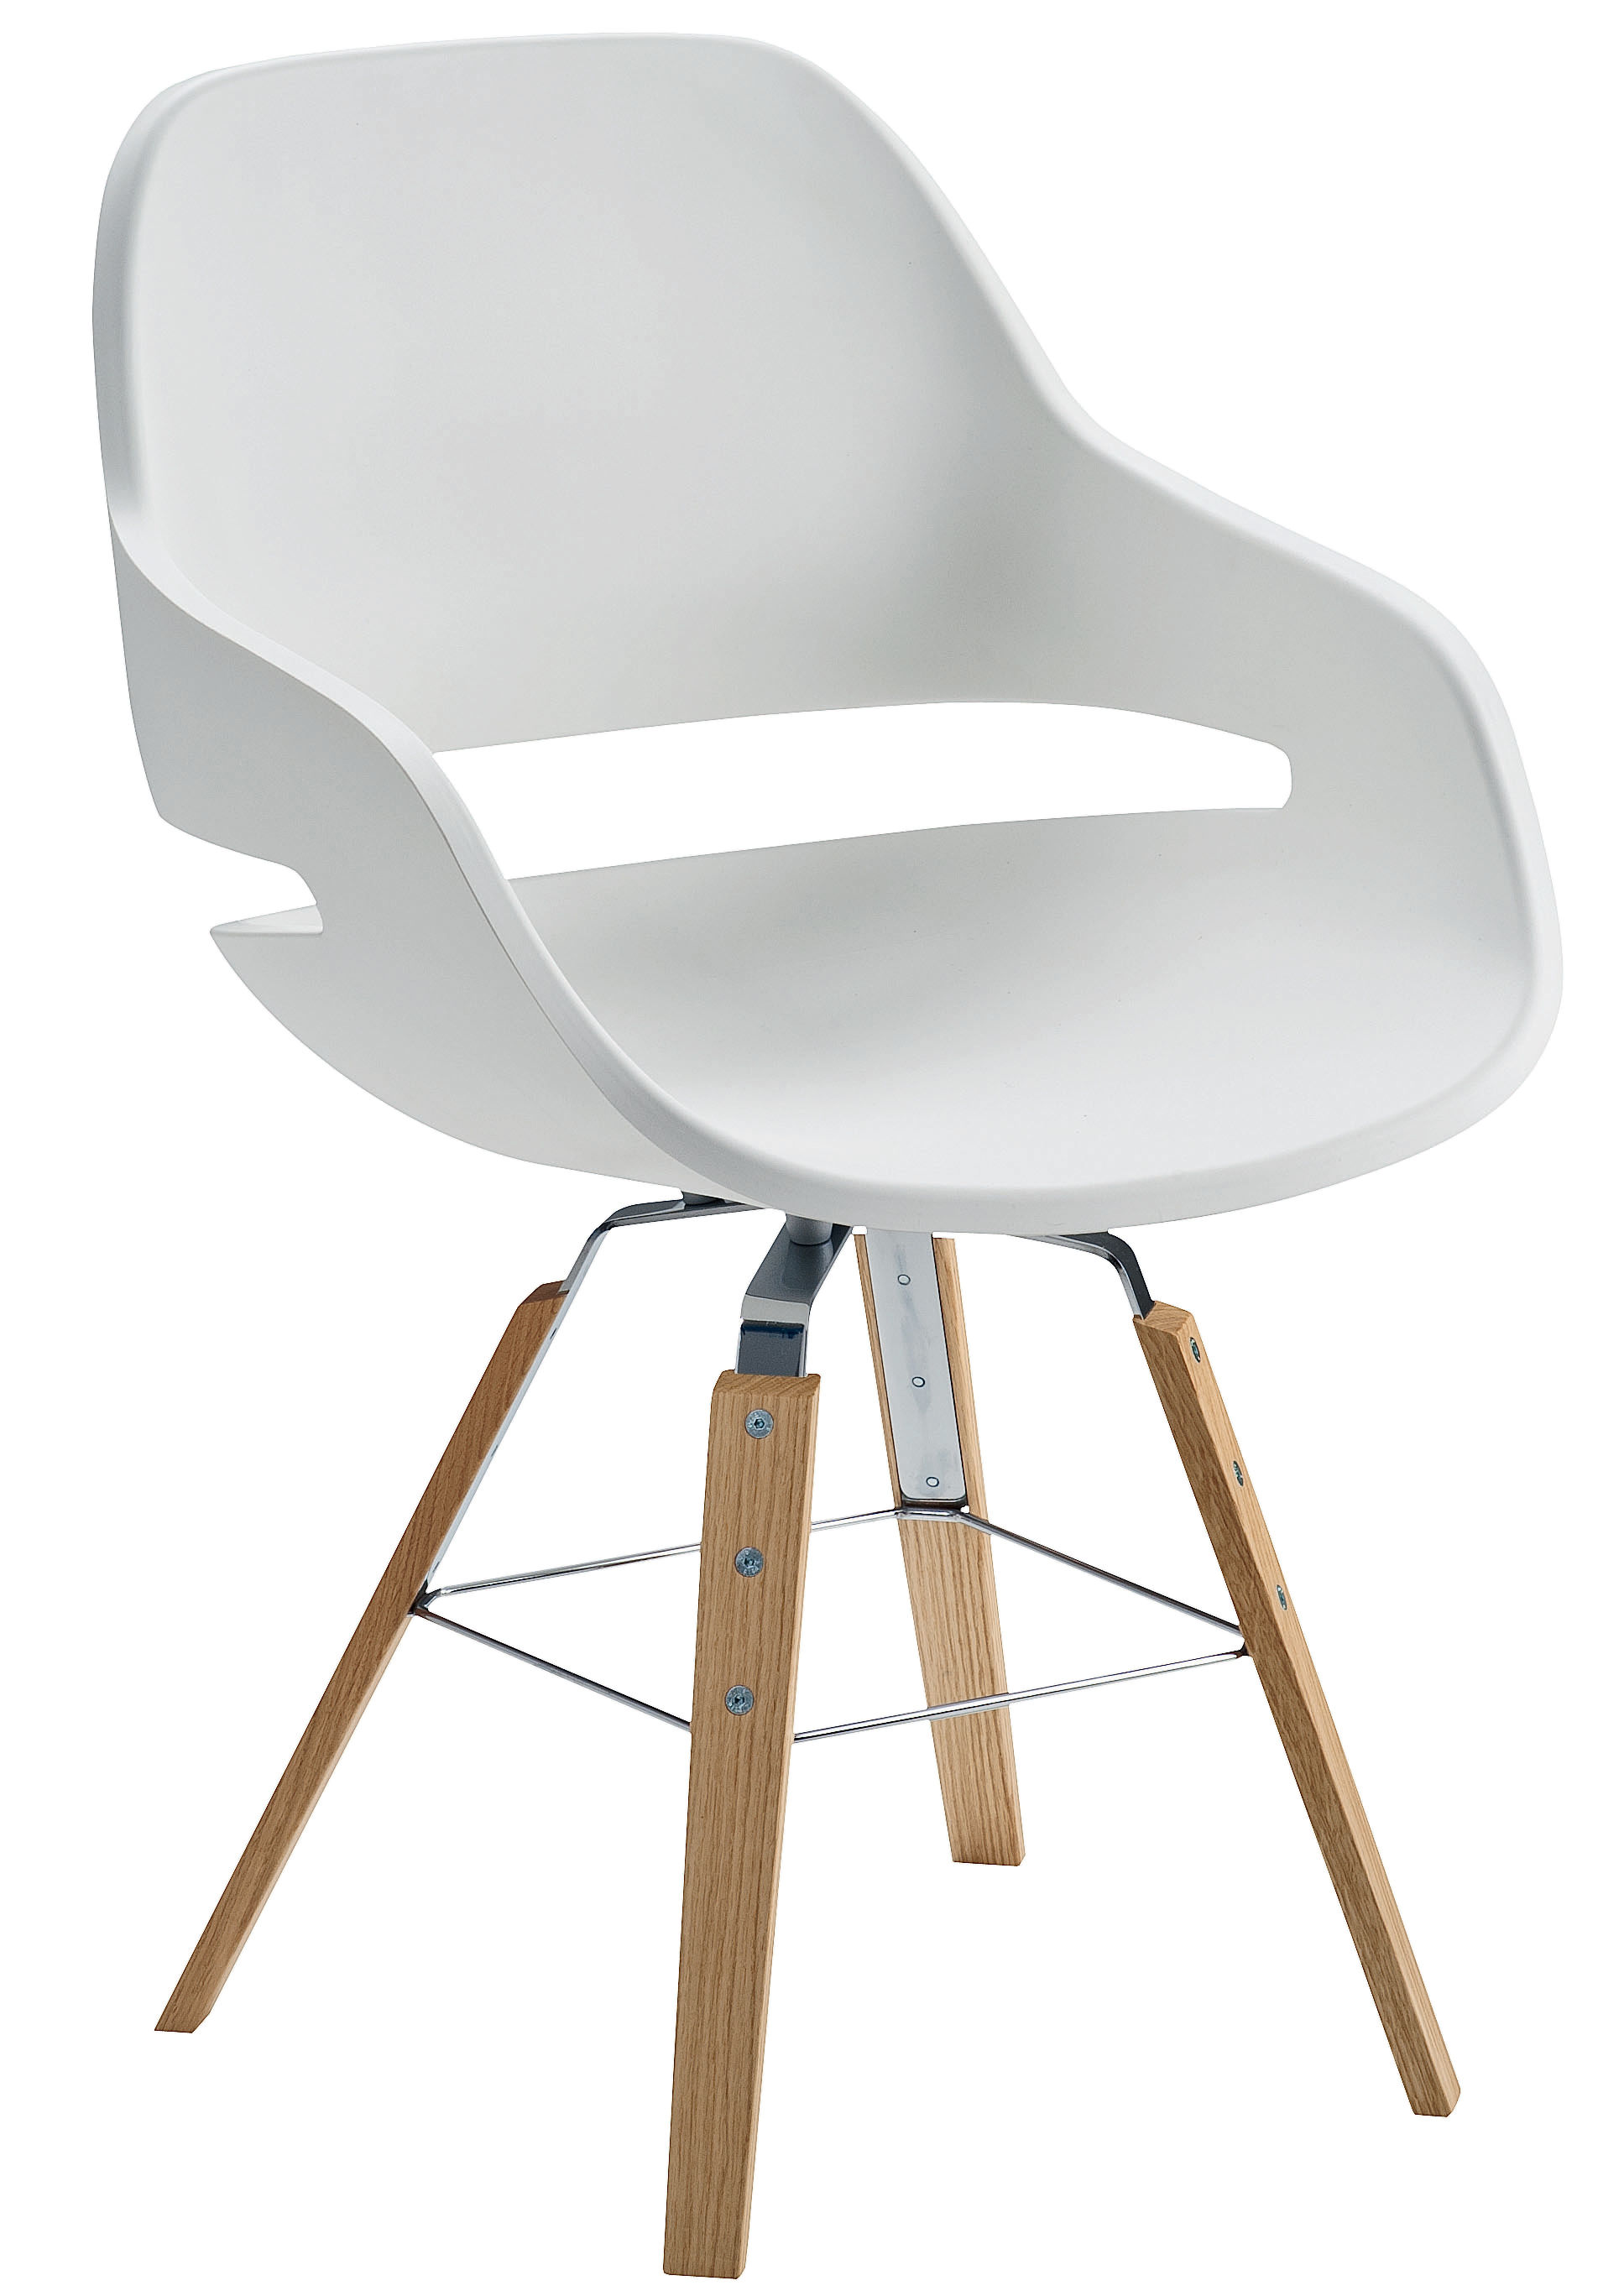 eva sessel polyurethan stuhlbeine aus holz sitzschale wei stuhlbeine holz natur by. Black Bedroom Furniture Sets. Home Design Ideas